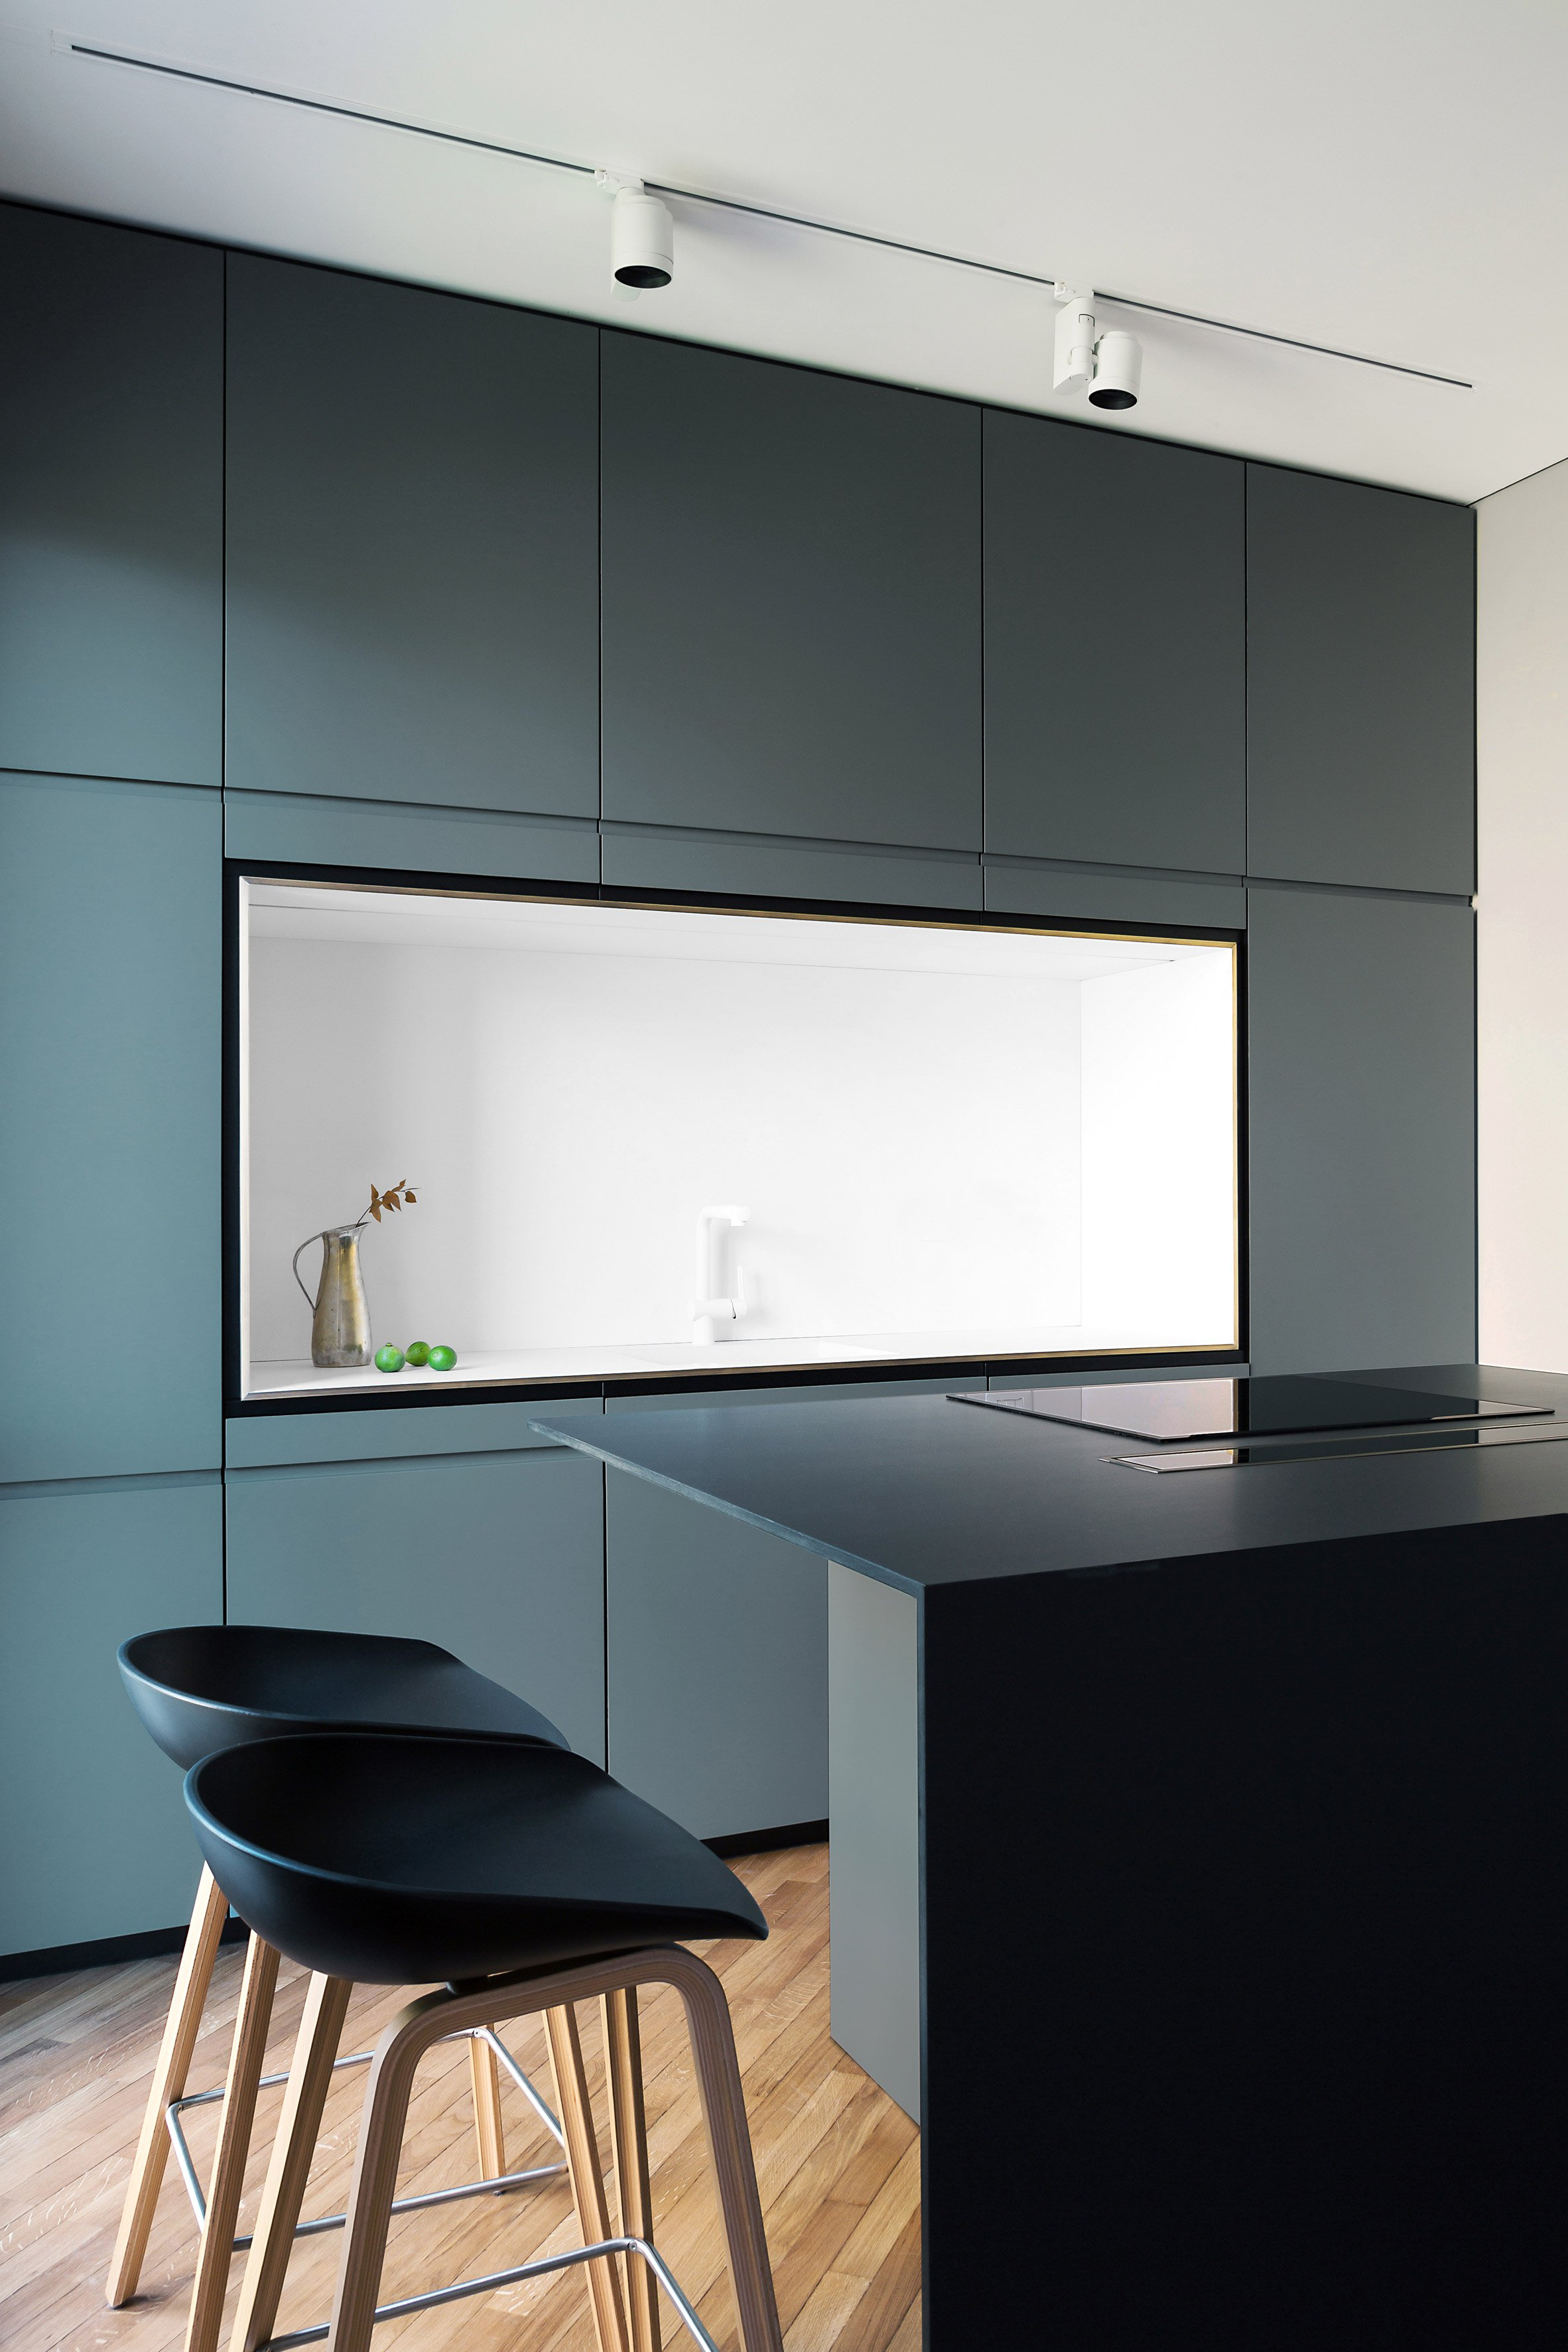 architecture-house-residential-design-studia-interiors-osnovadesign-osnova-poltava_12